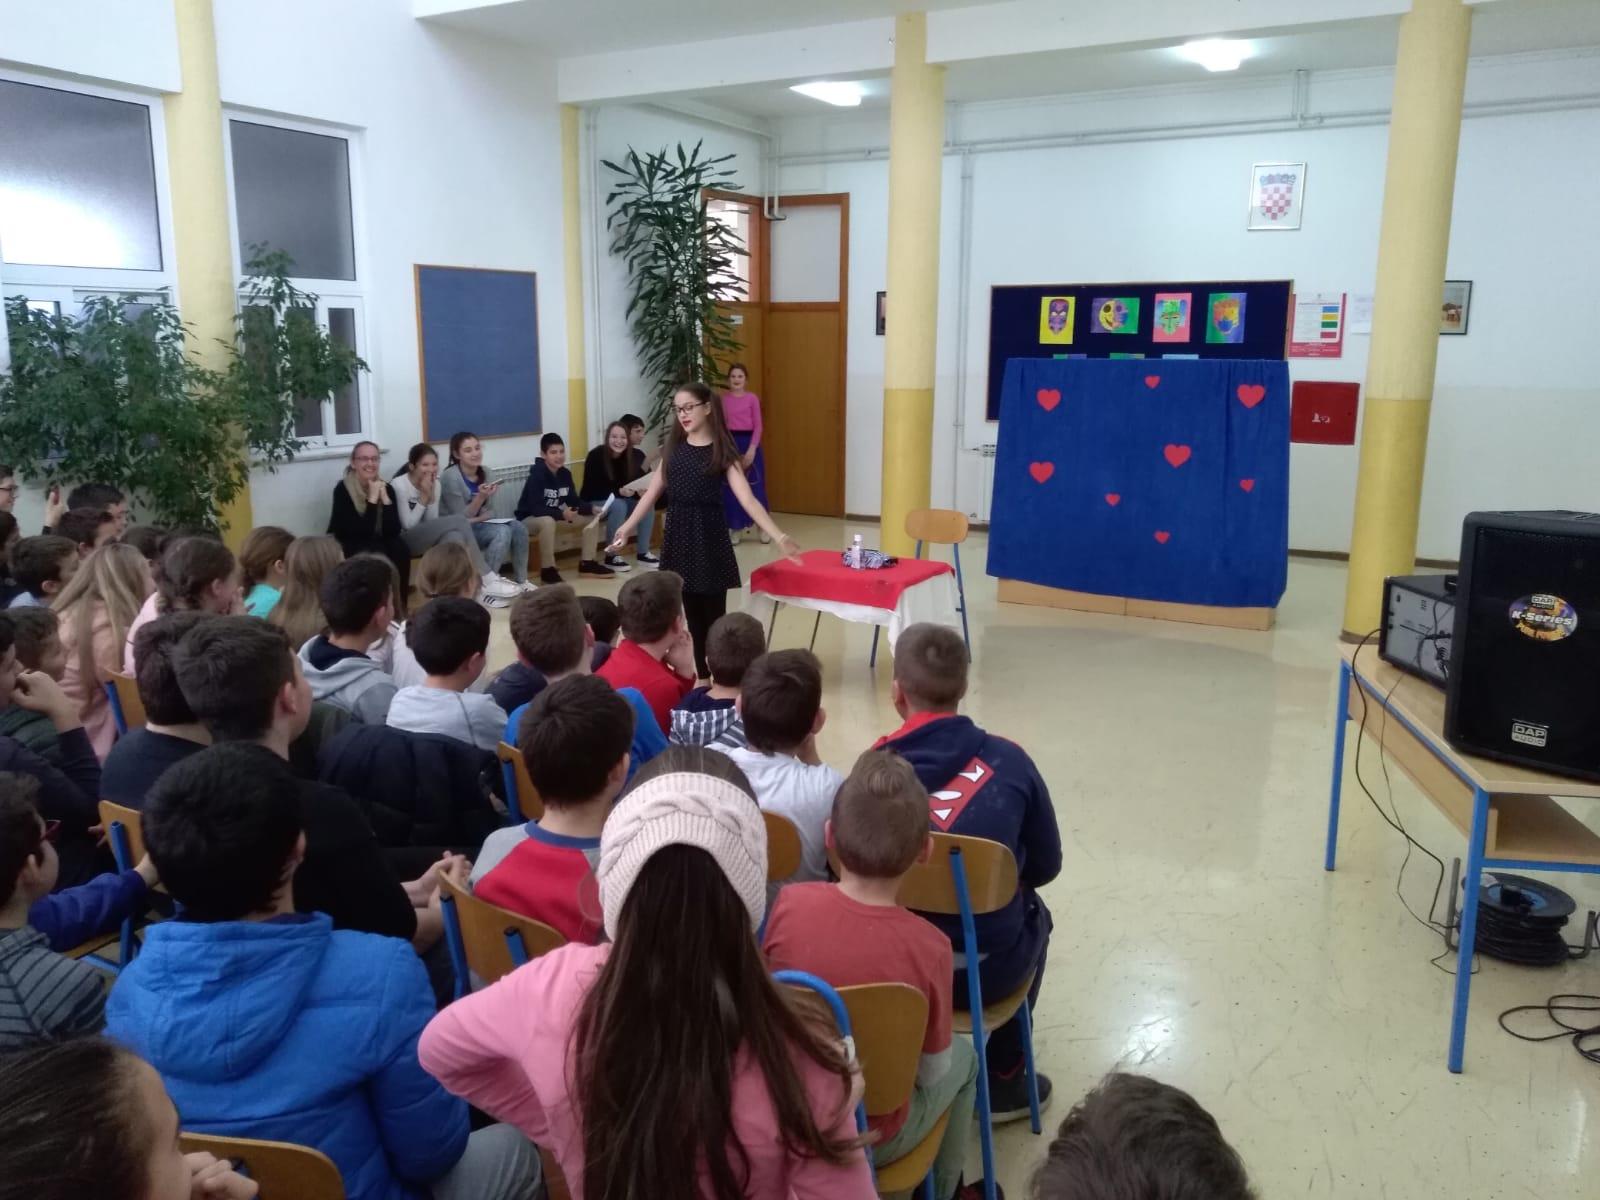 Osnovna Skola Ivan Goran Kovacic Lisane Ostrovicke Naslovnica